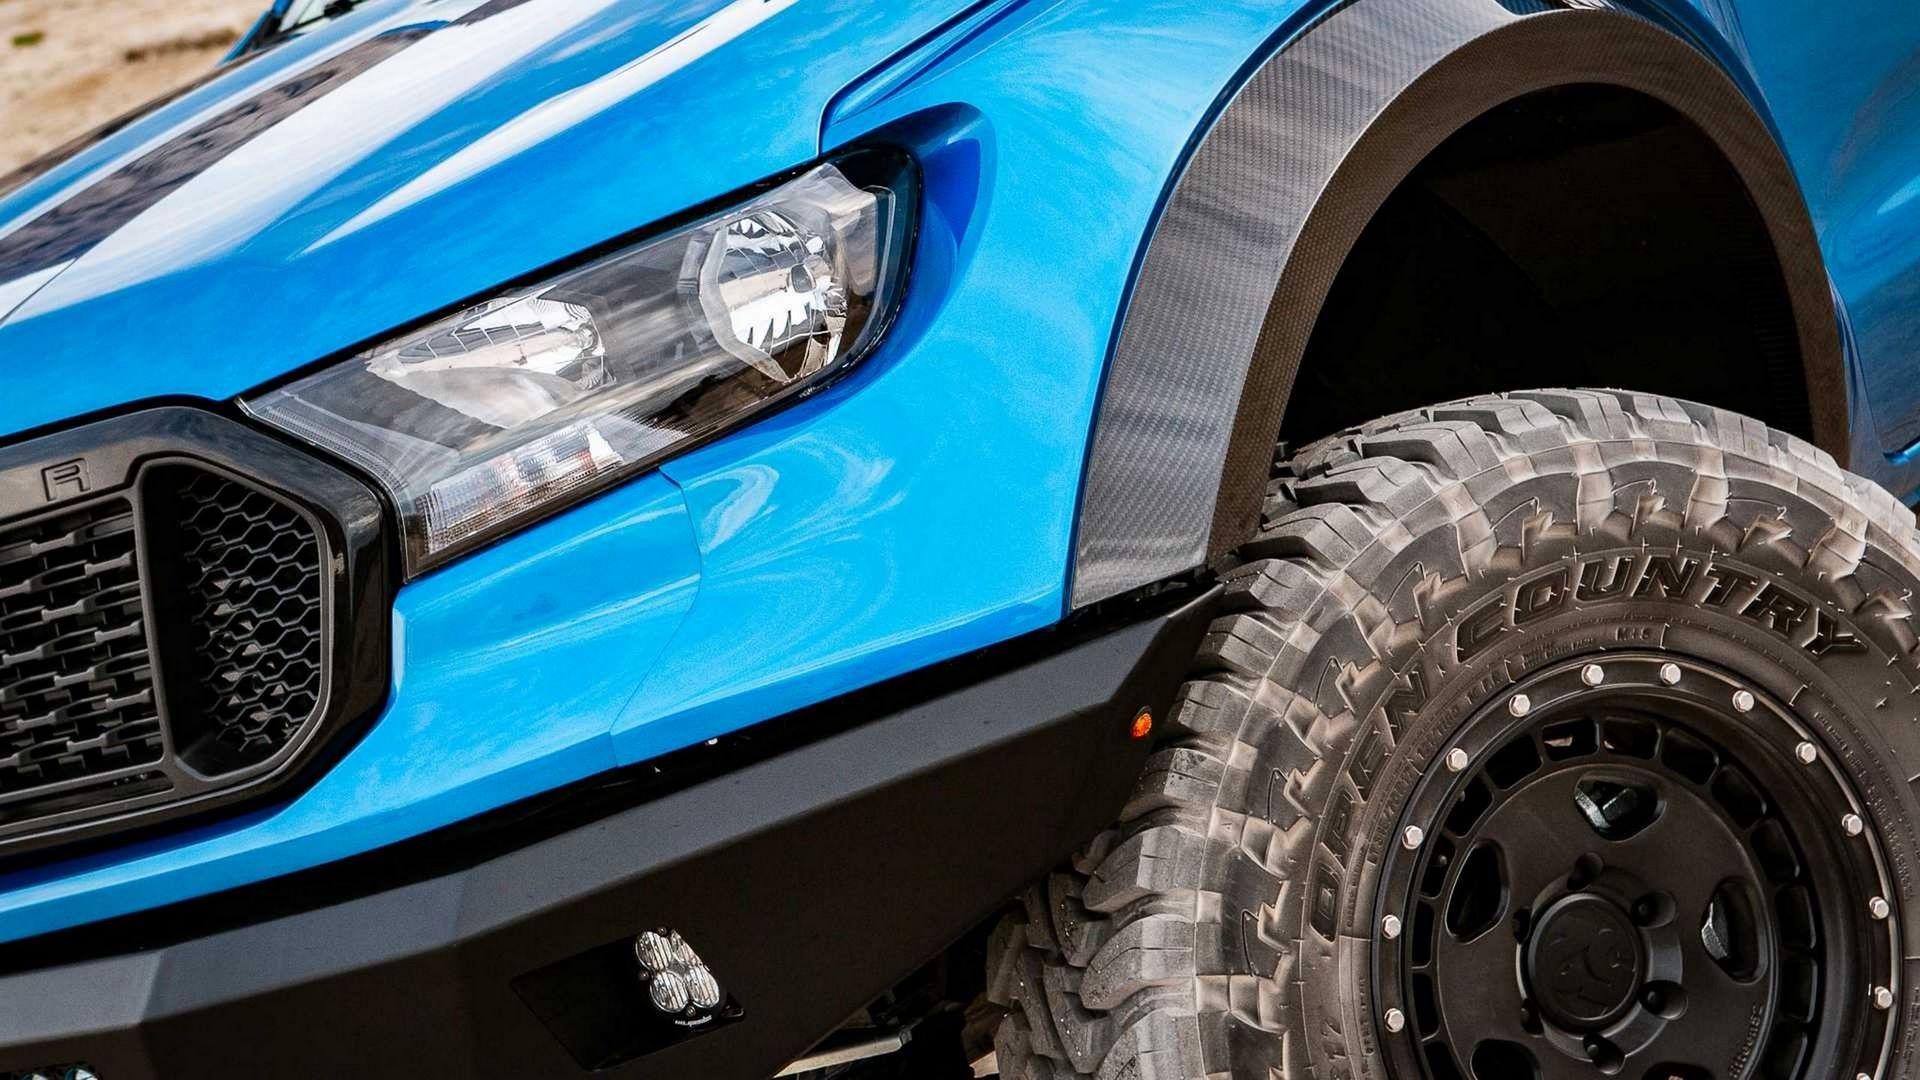 Ford-Ranger-Prorunner-By-APG-36